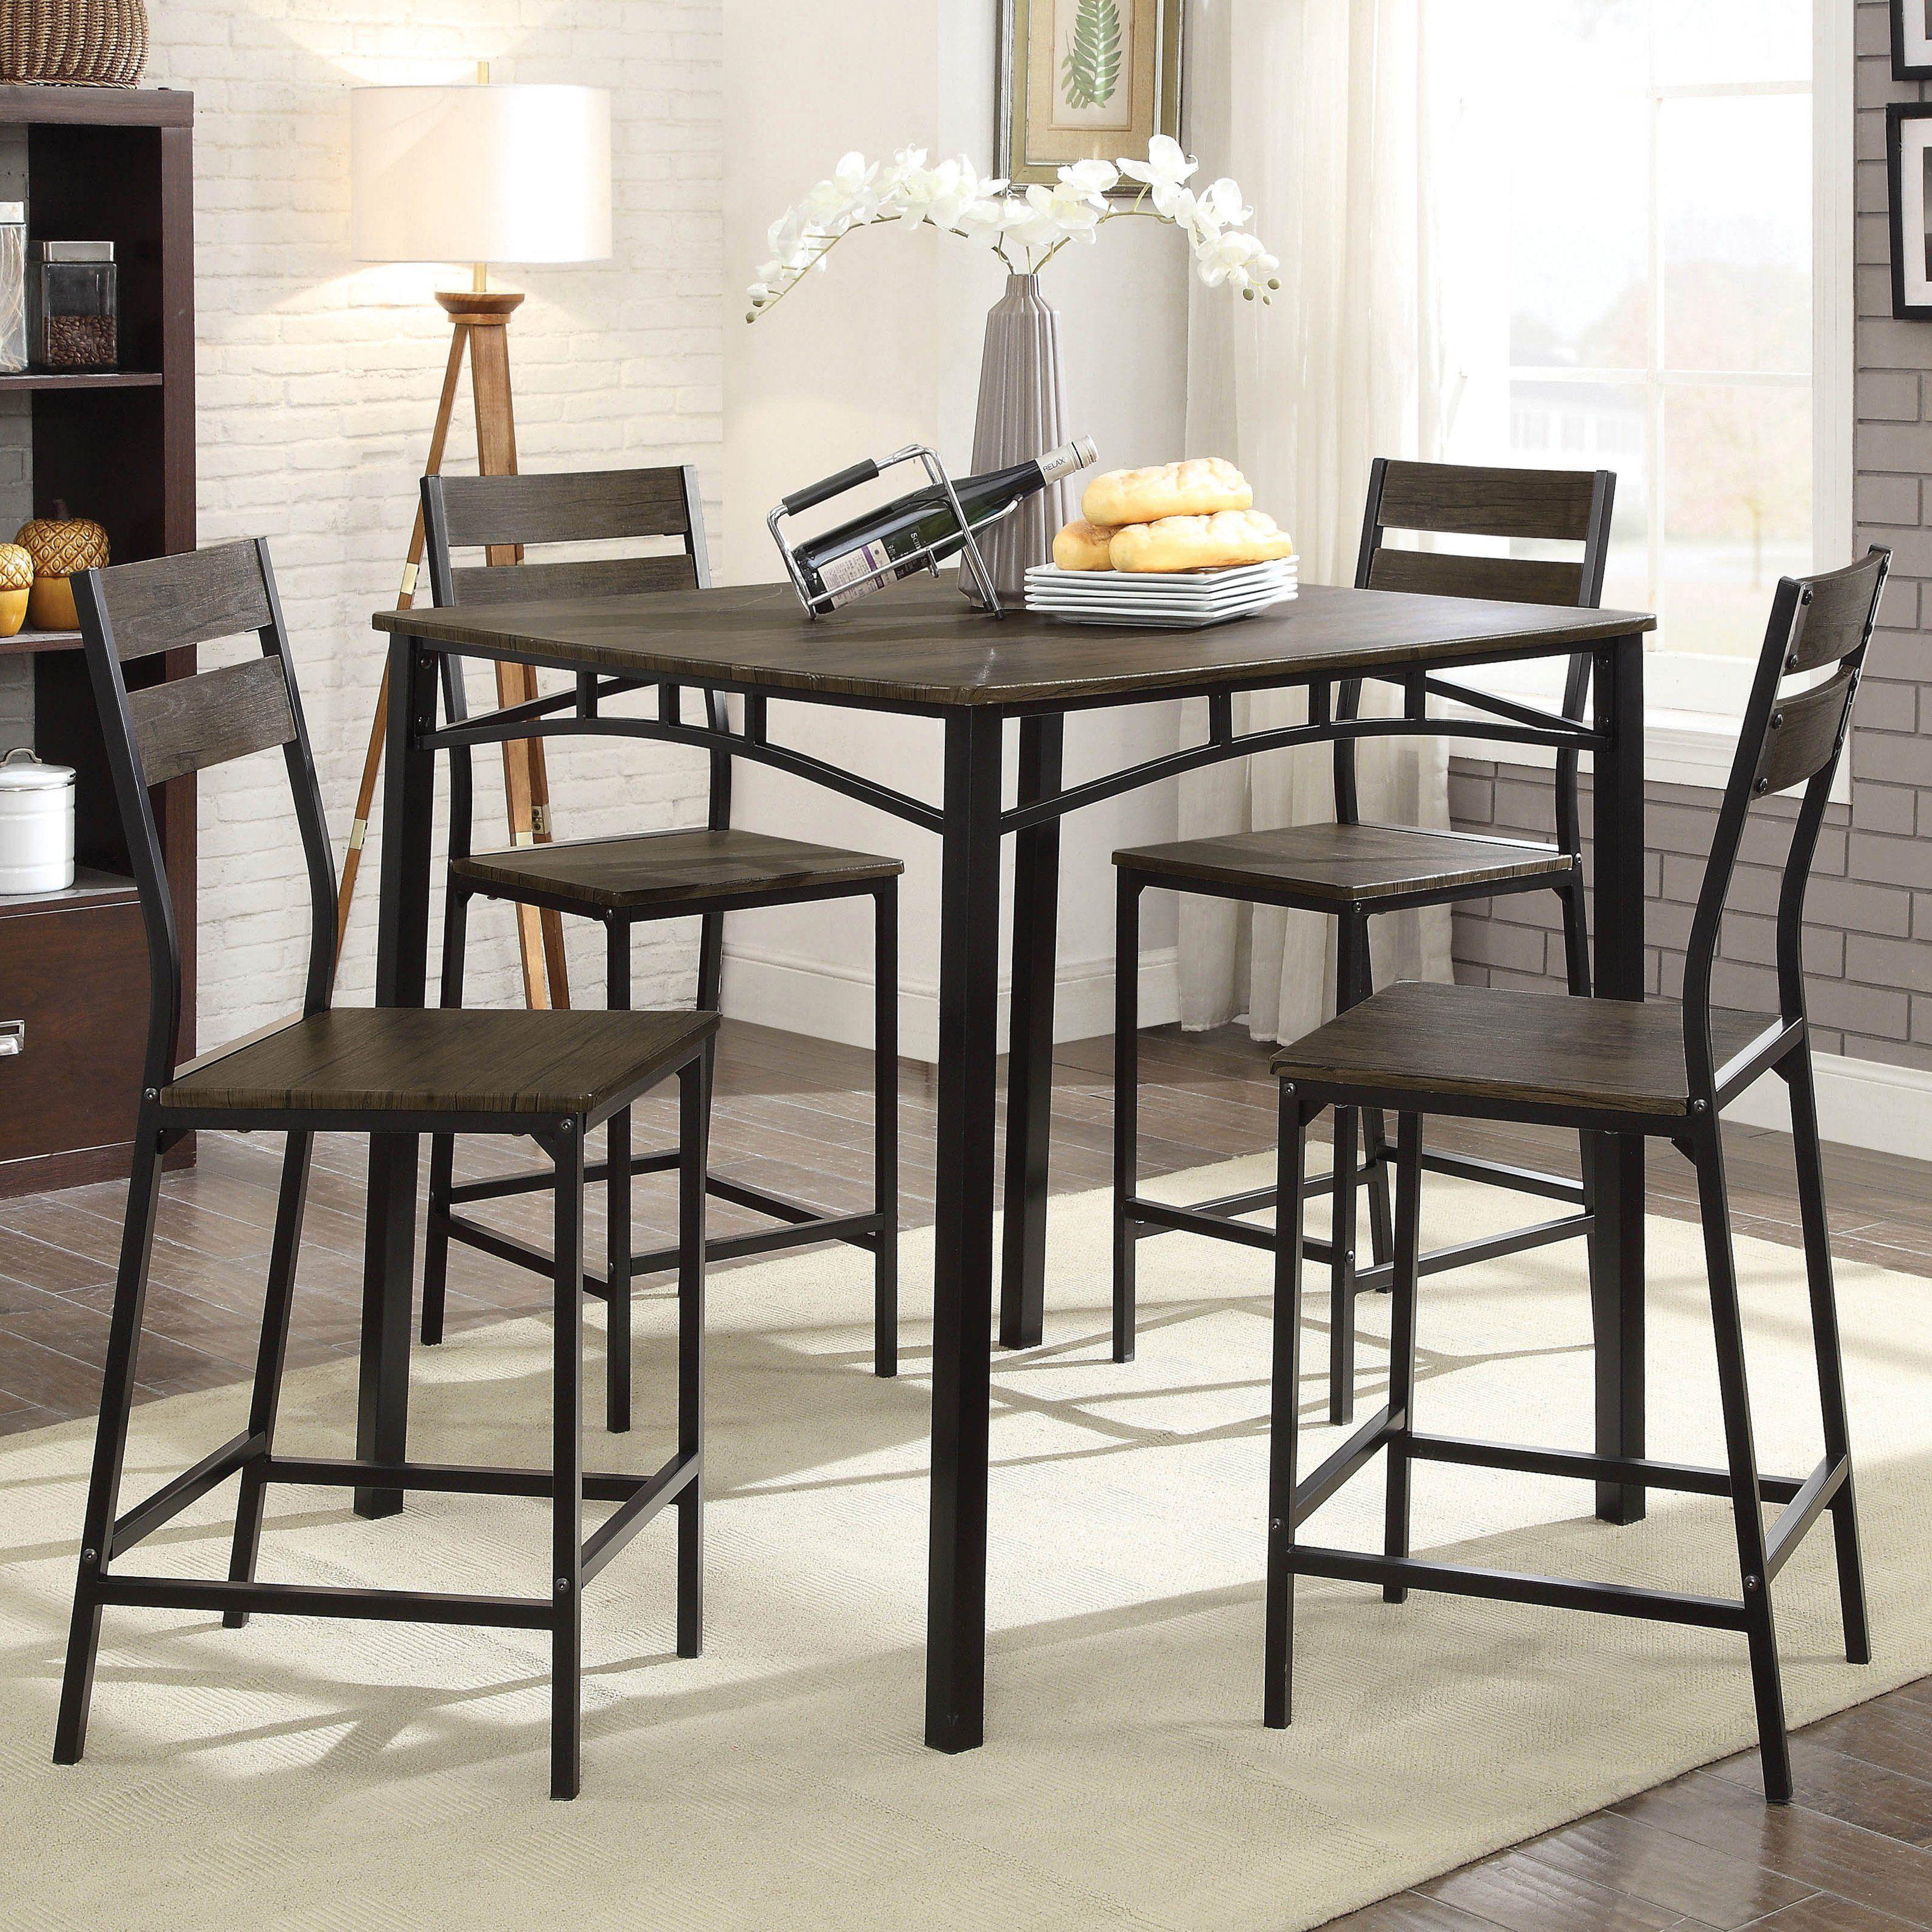 Furniture Of America Patton Rustic Modern 5 Piece Counter